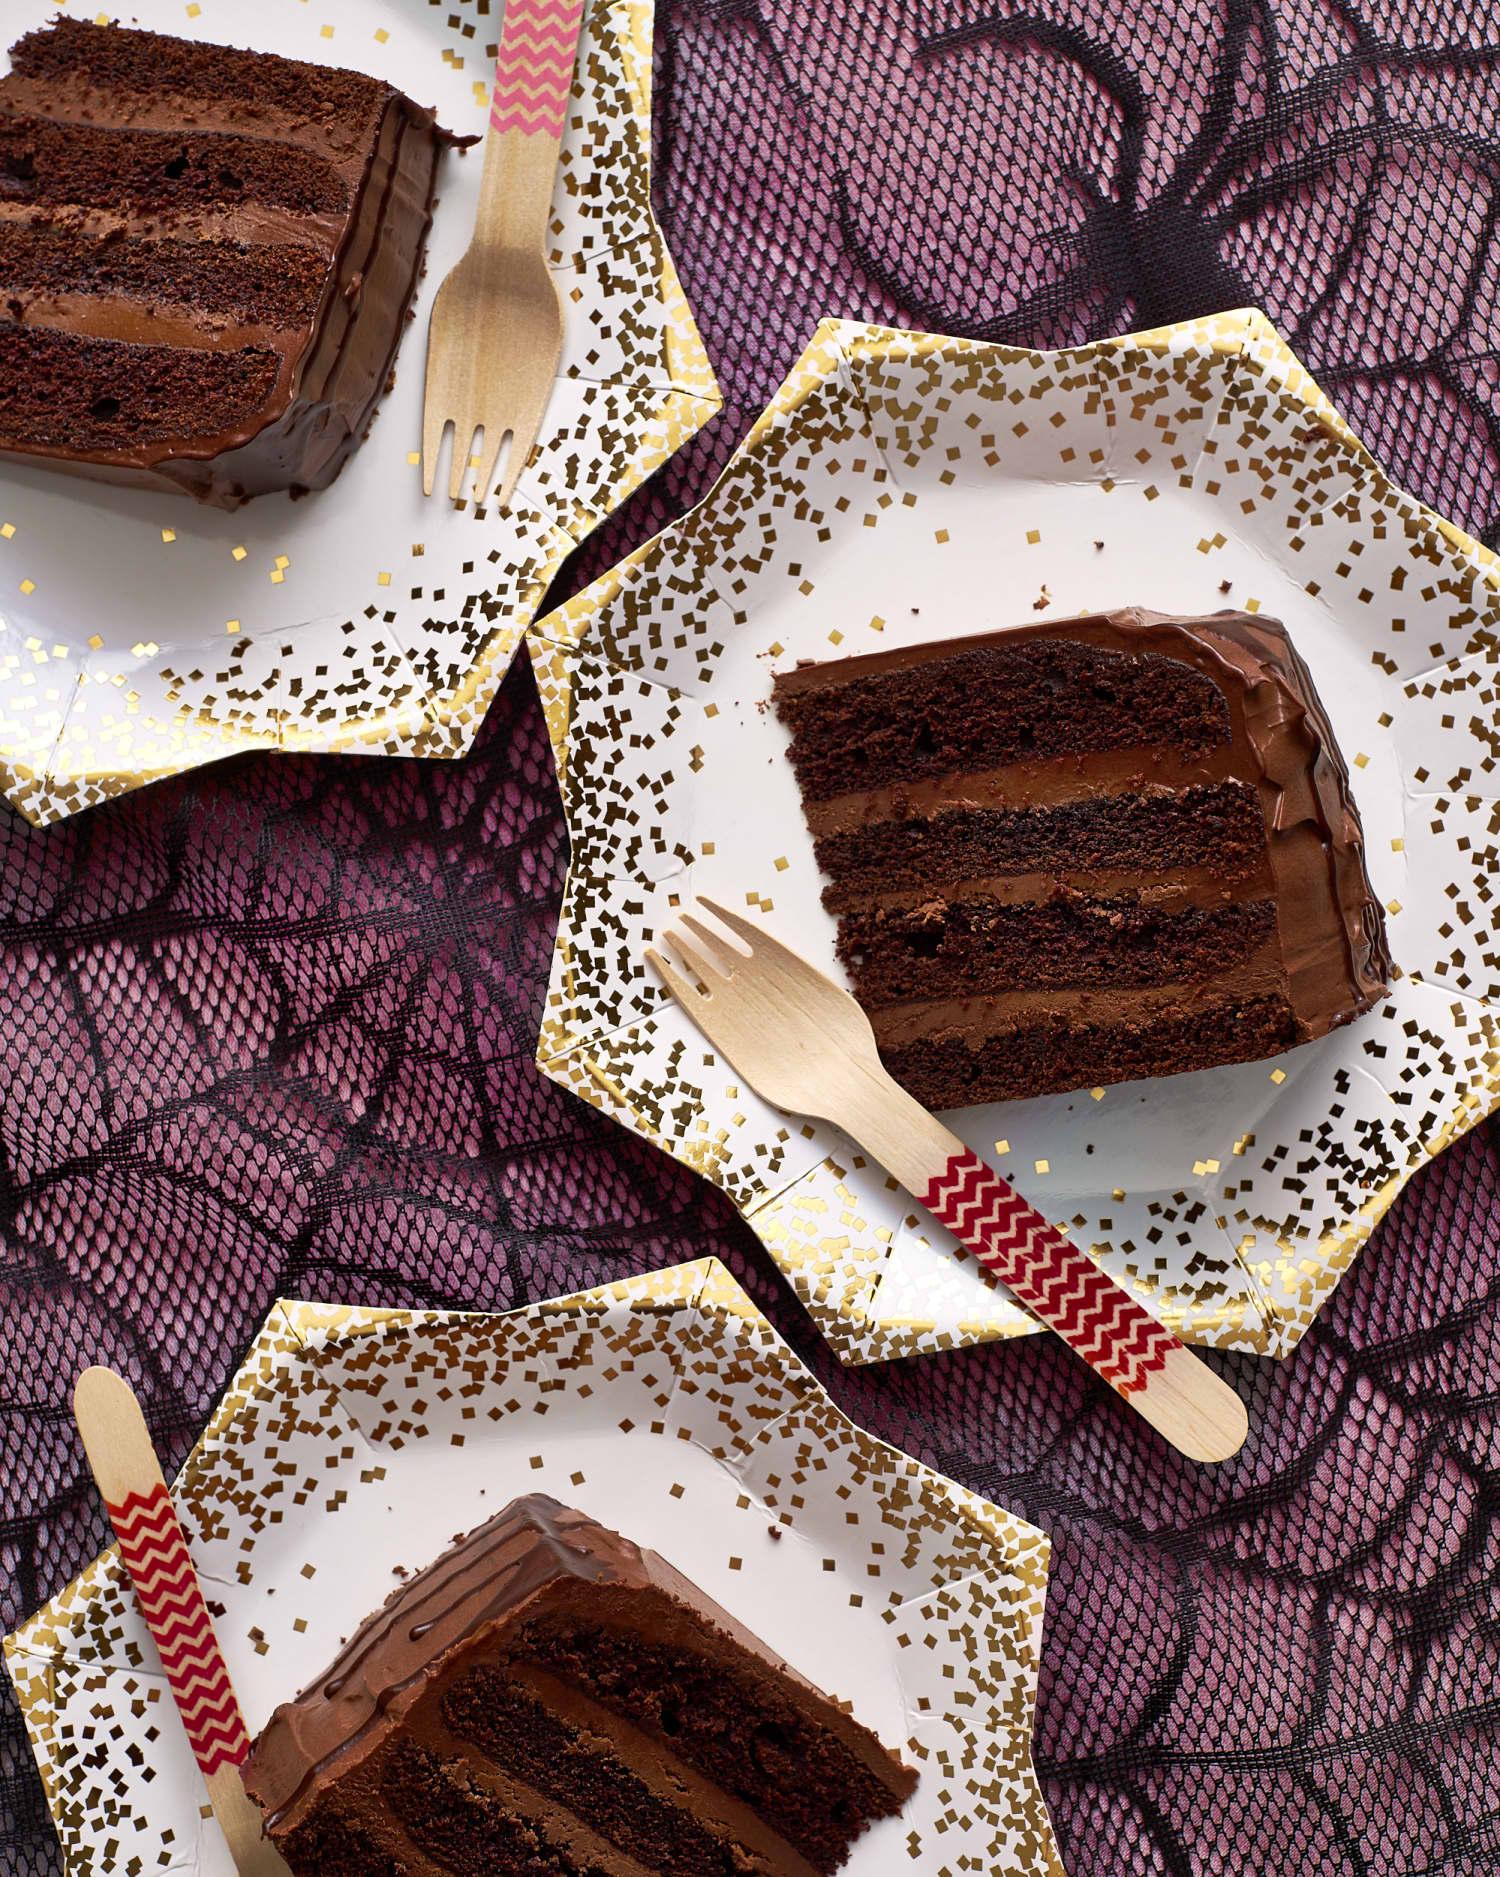 How To Make the Deepest, Darkest Chocolate Cake